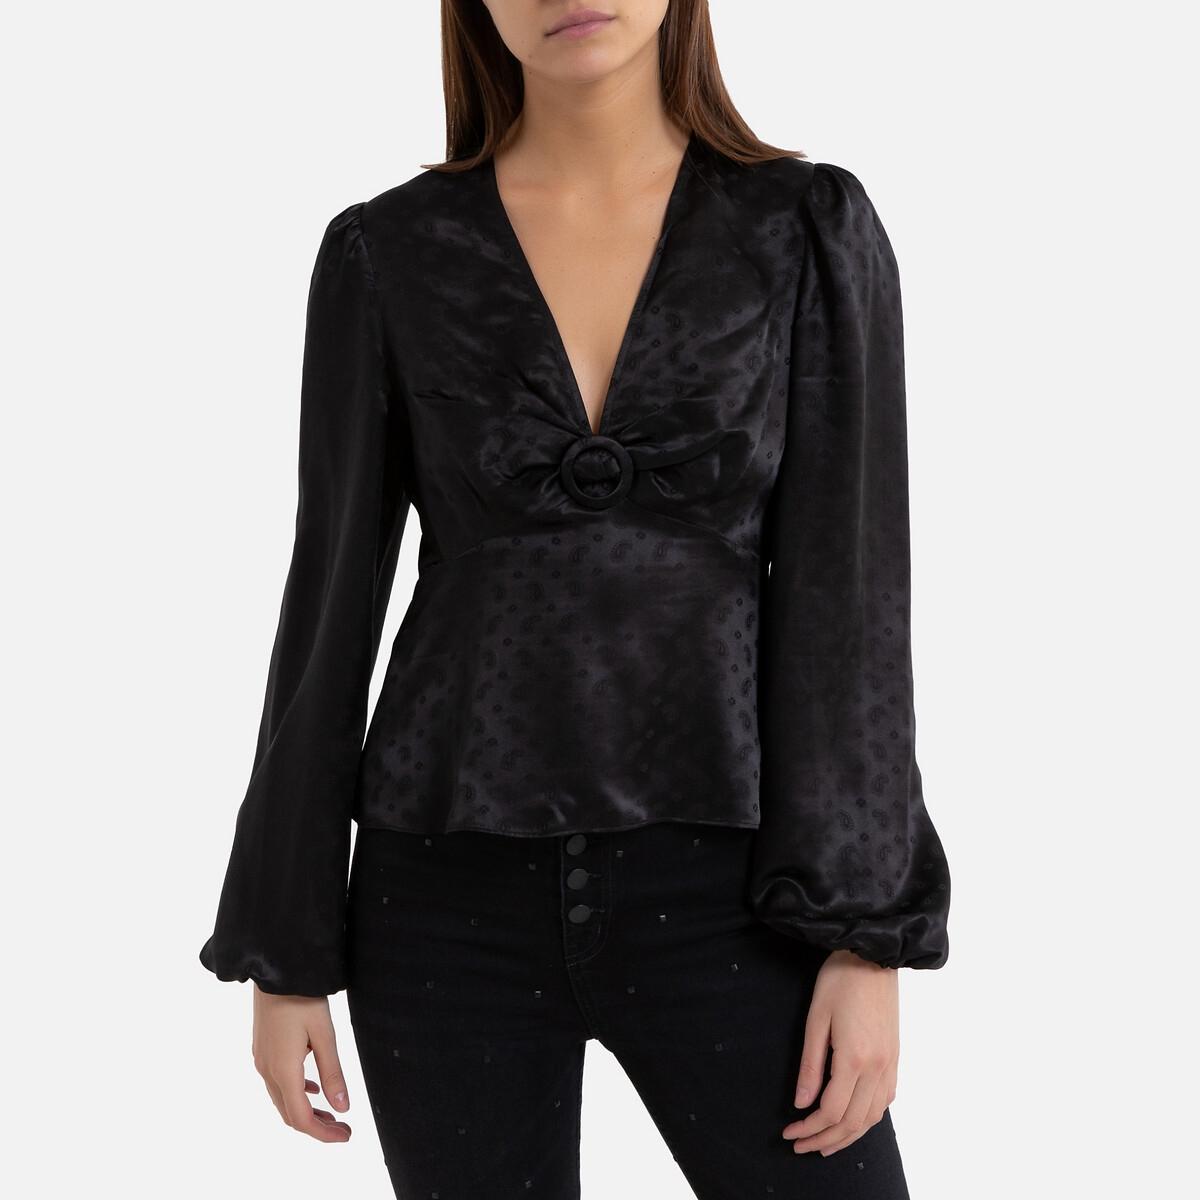 Blusa satinada con estampado jacquard, de manga larga